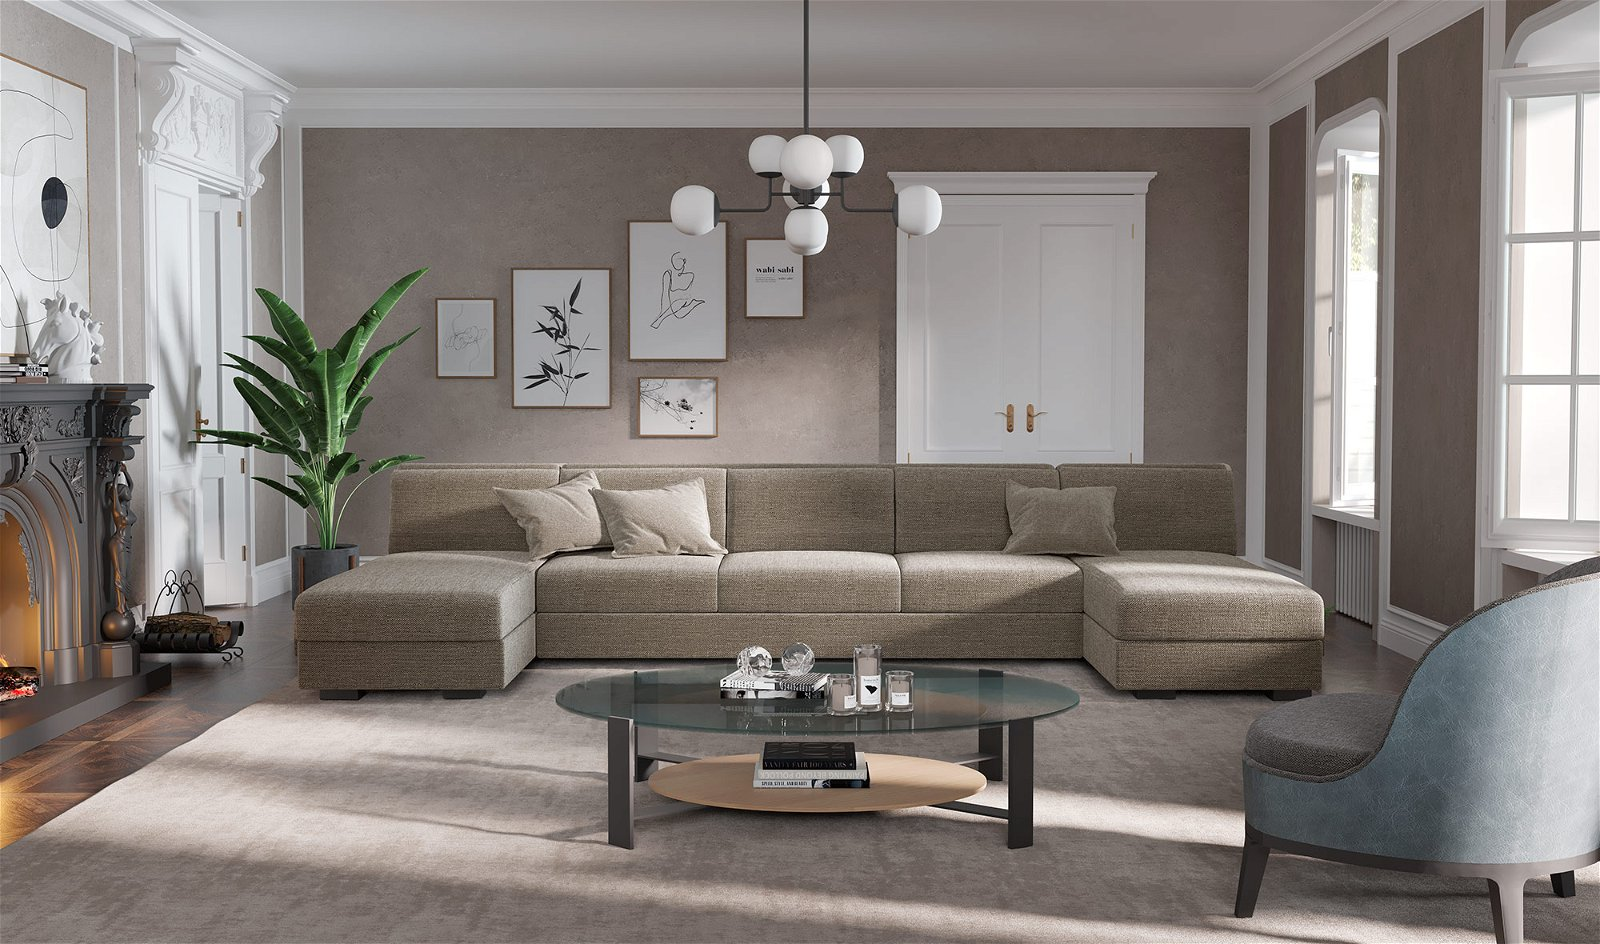 Sofá doble chaise longue de diseño Manhattan